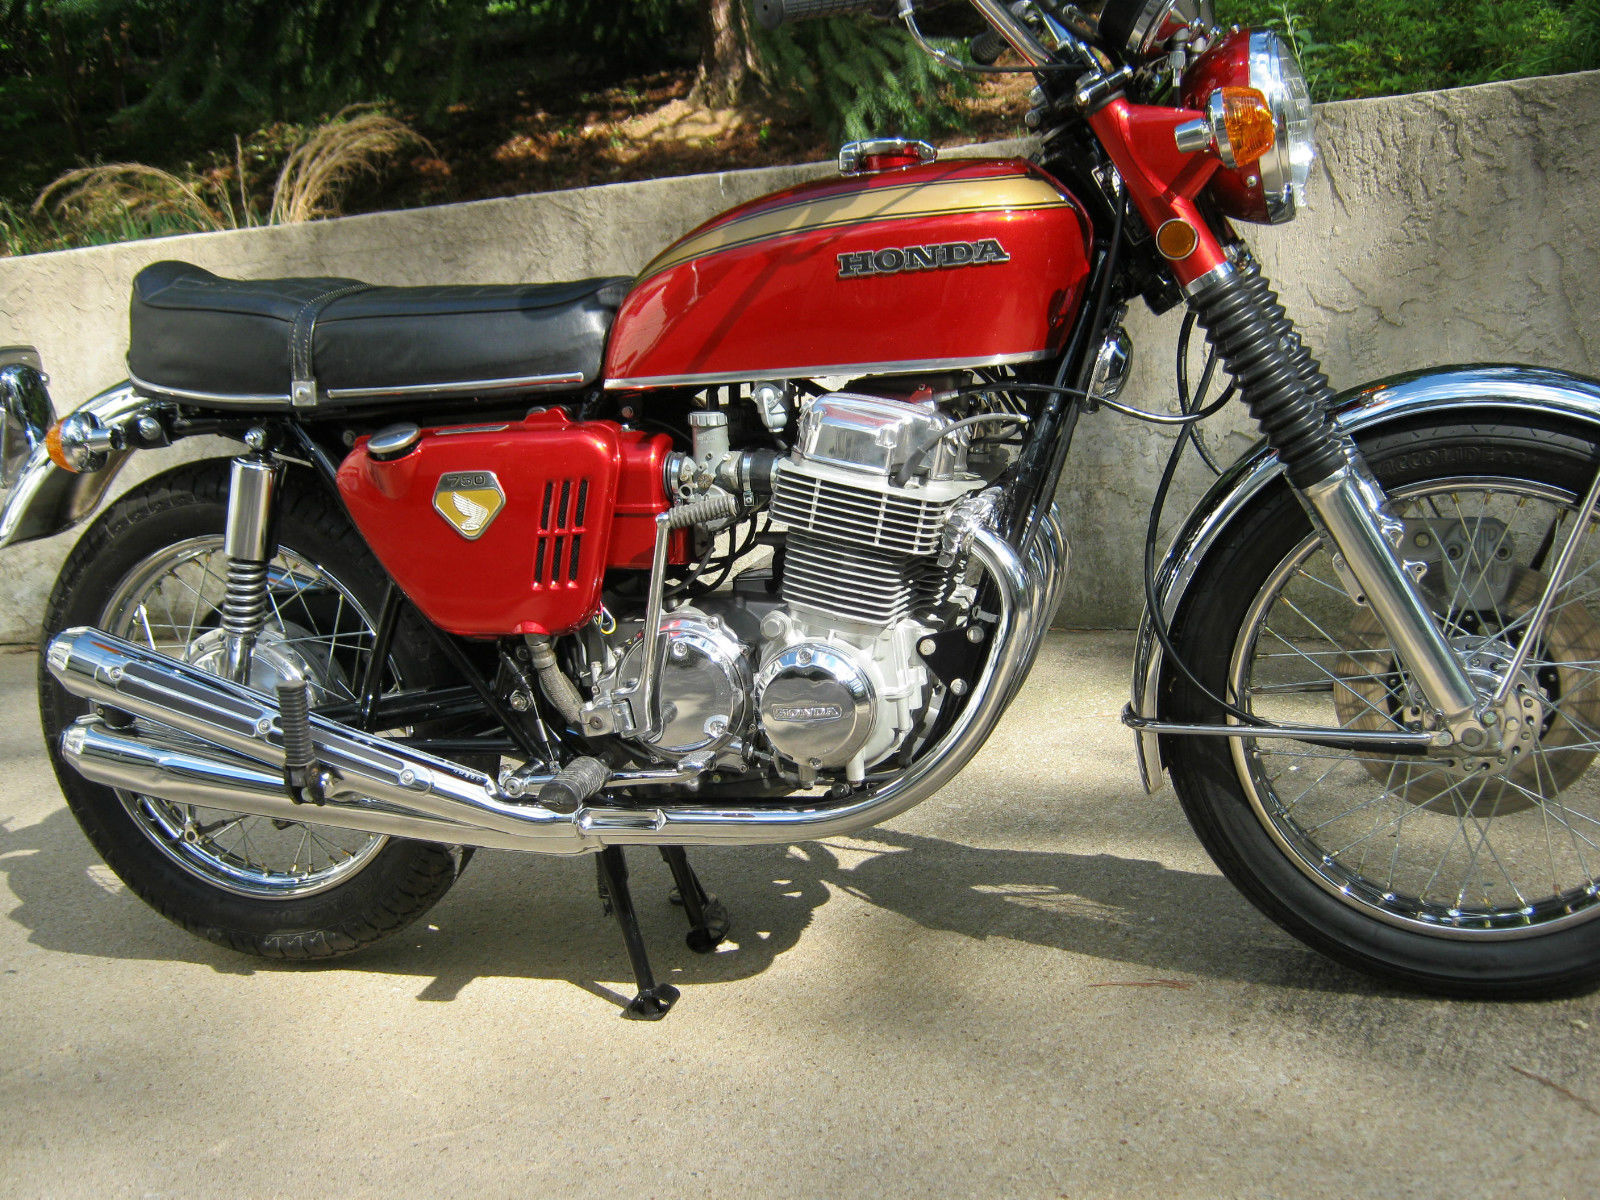 Honda CB750K0 -1969 - Fuel Tank, Side Panel, Fork Ears, Reflector and Kick Start.